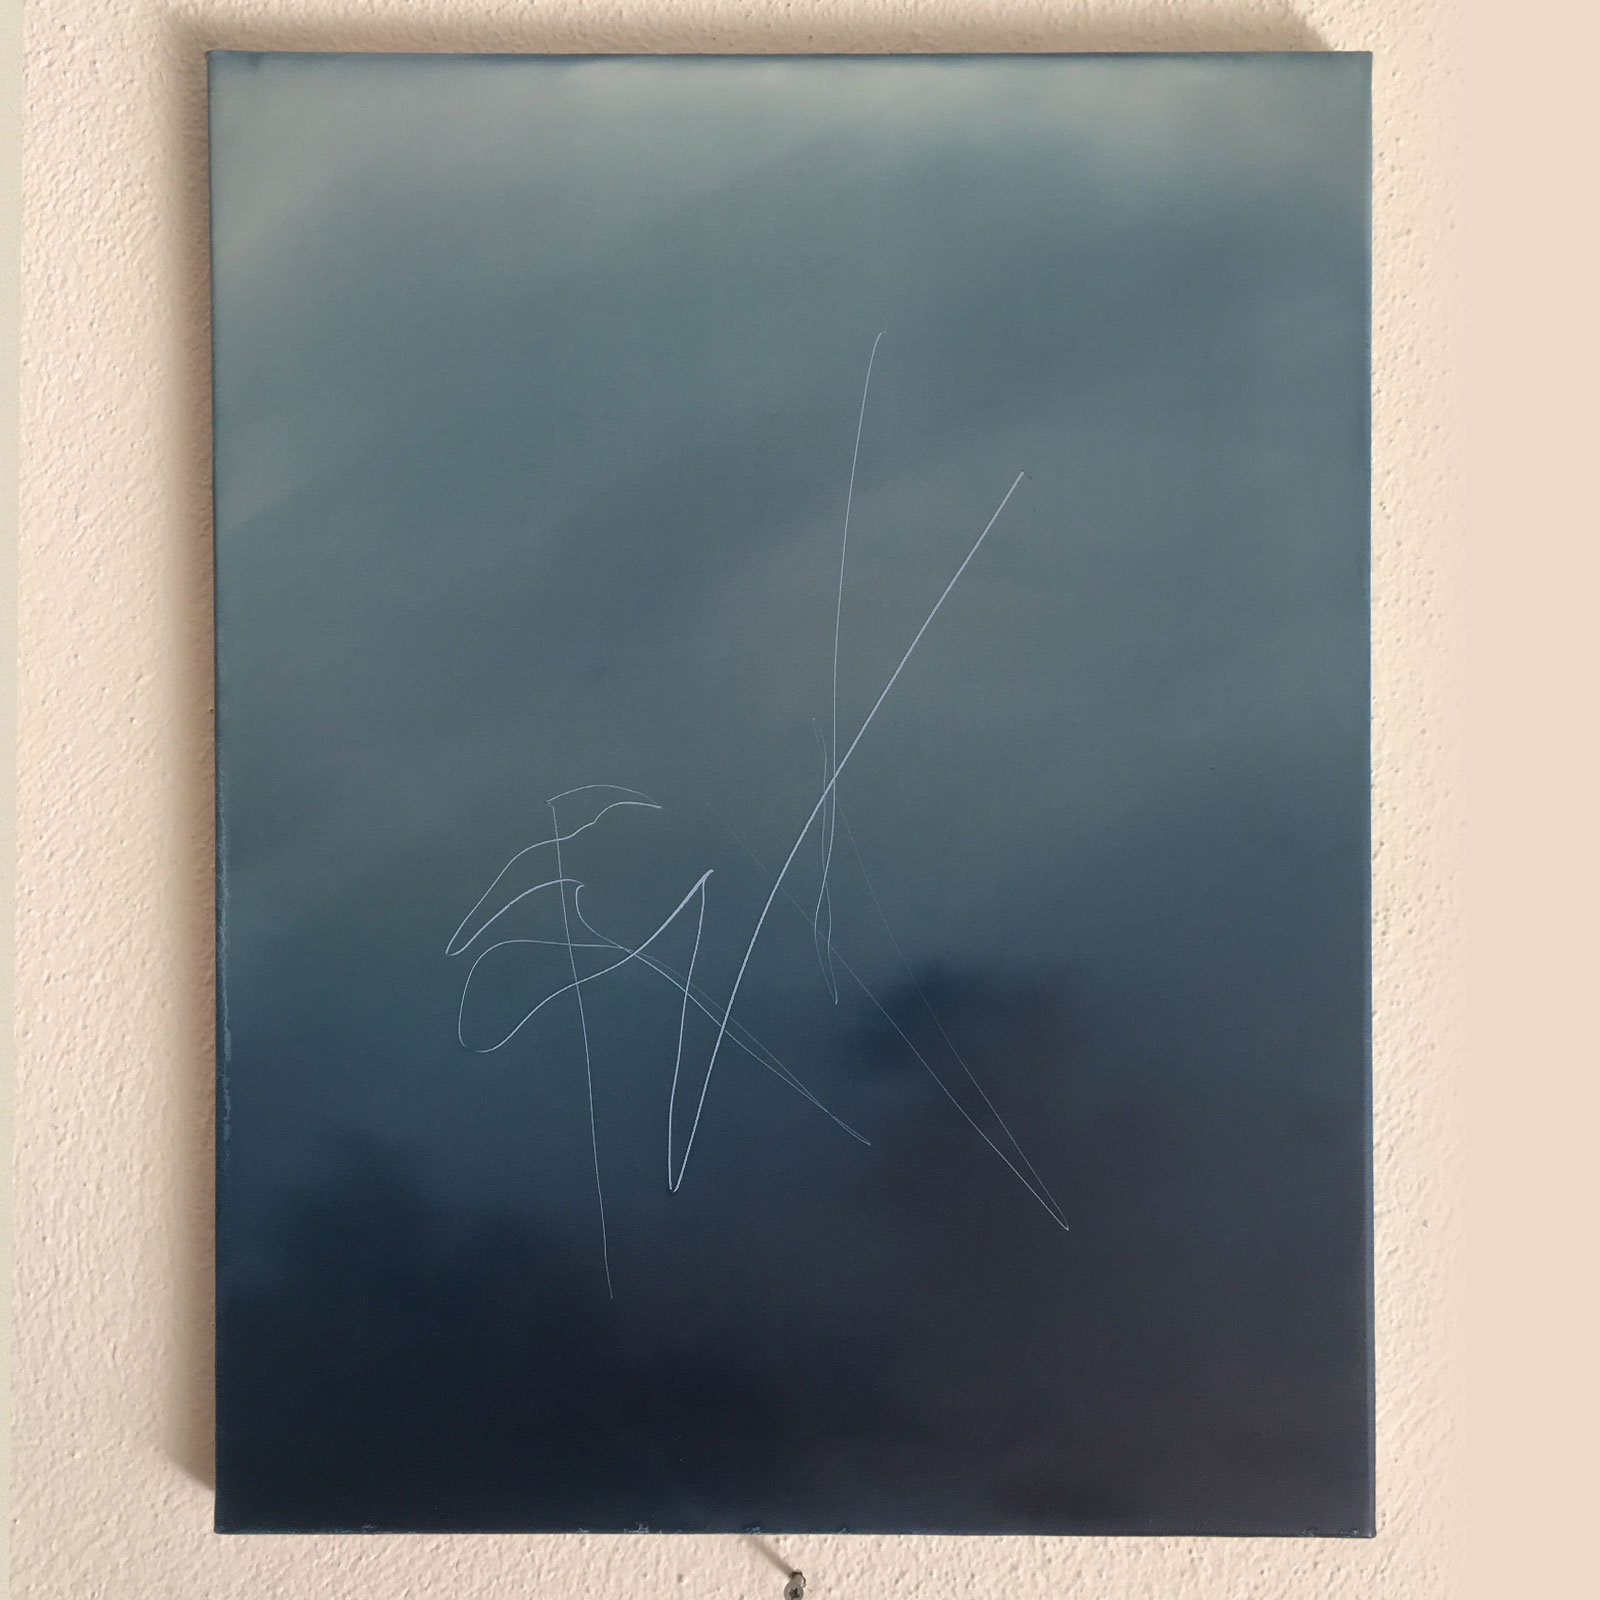 T#195-2020, oil on canvas, 50x40cm, priv. coll.